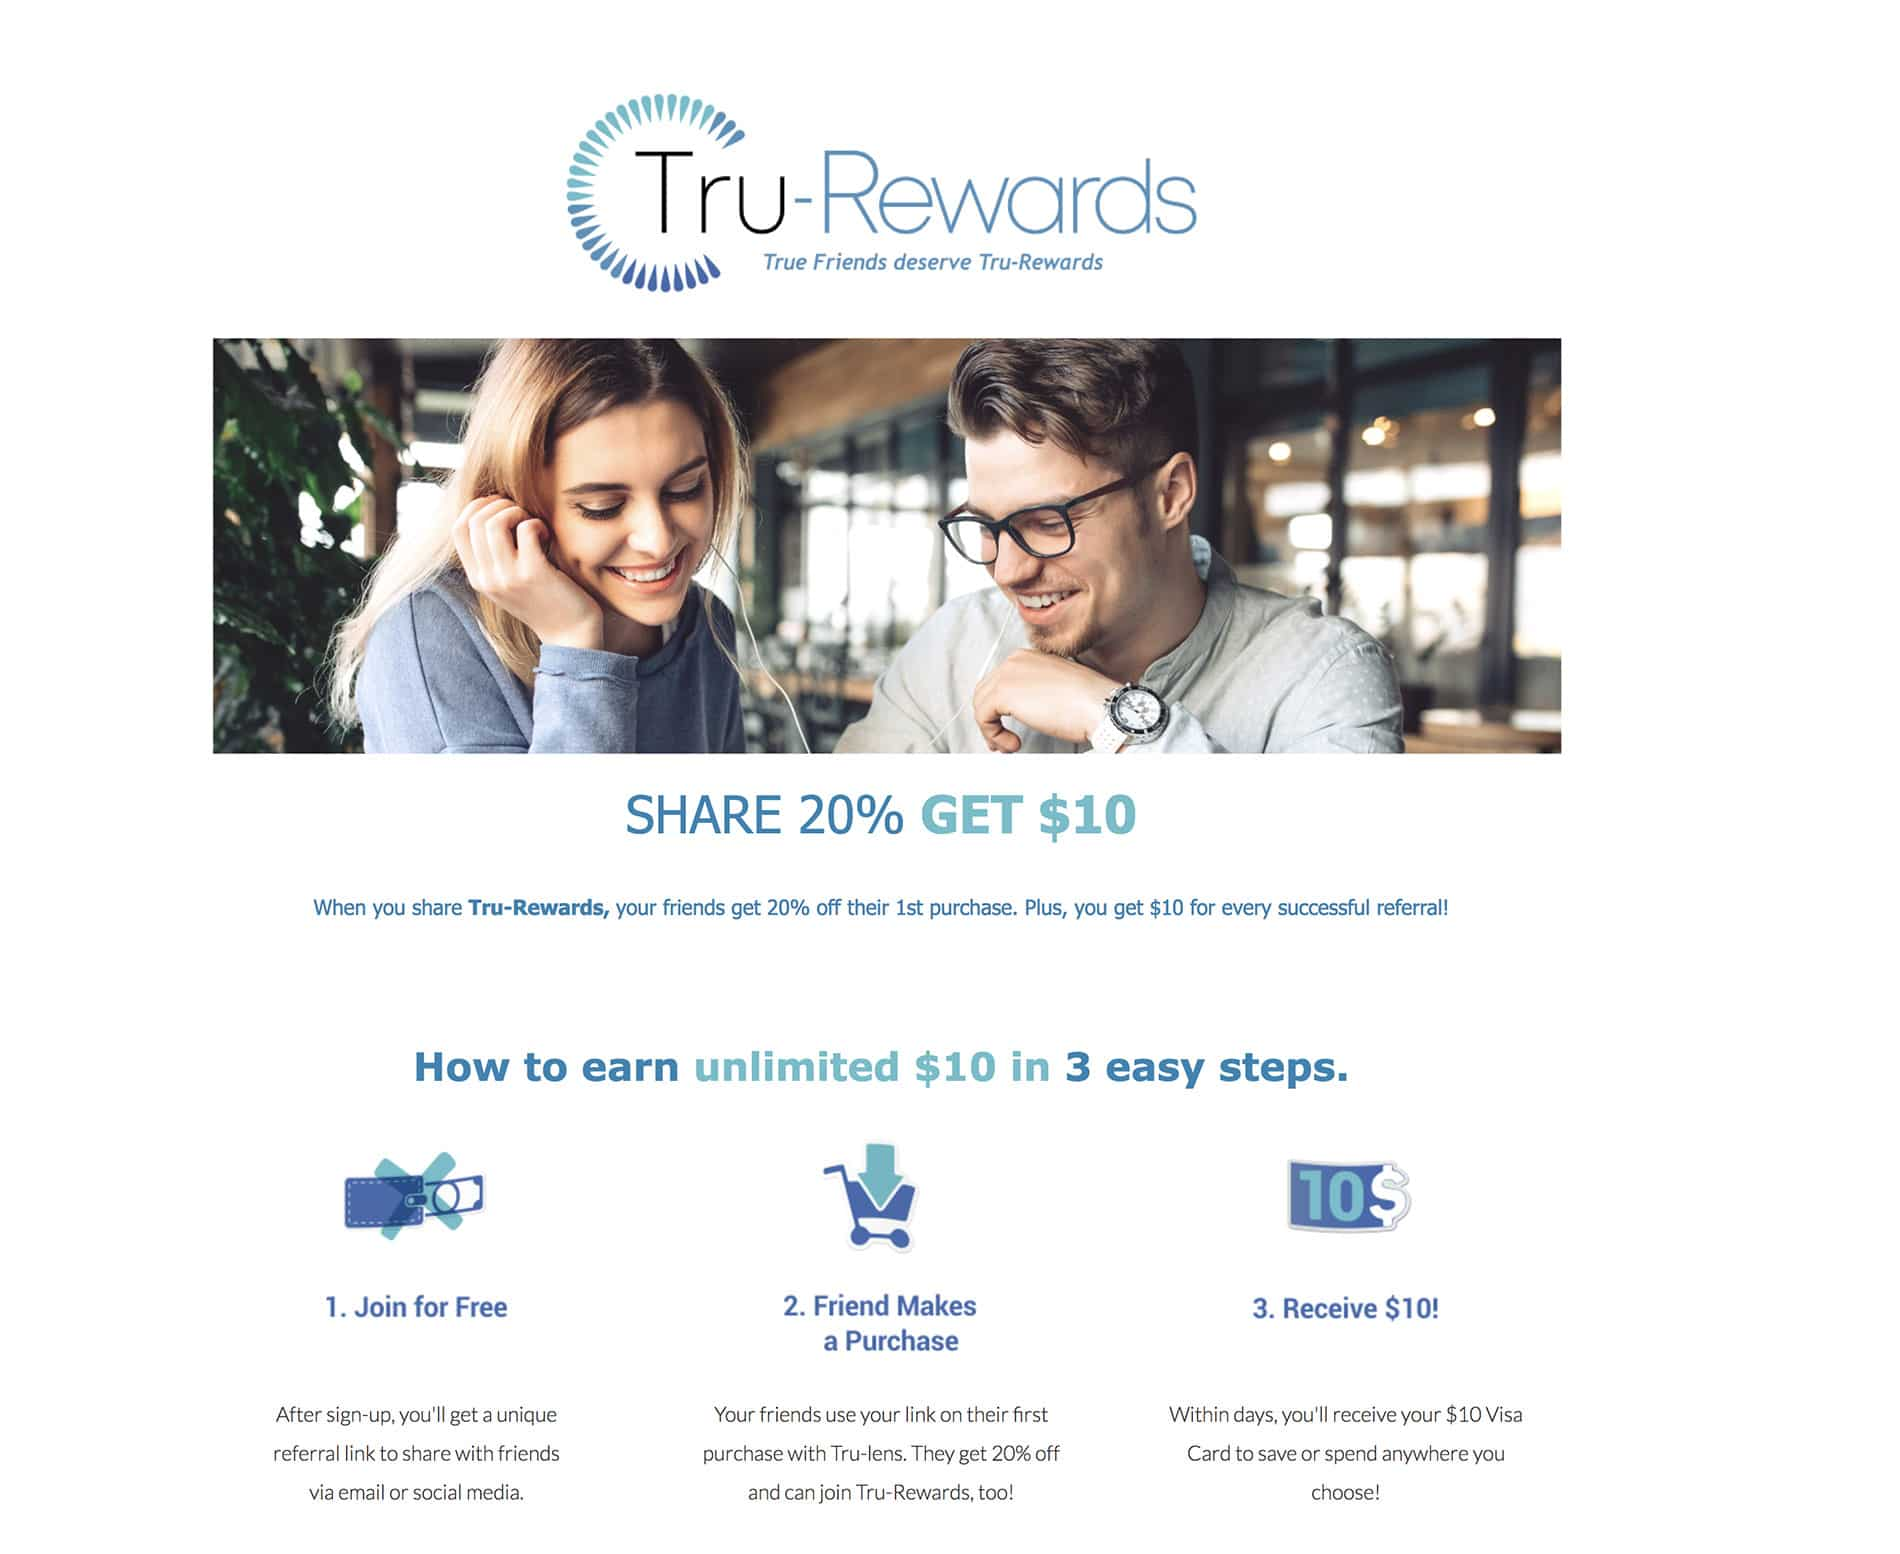 Regina Tuzzolino landing page rewards program project